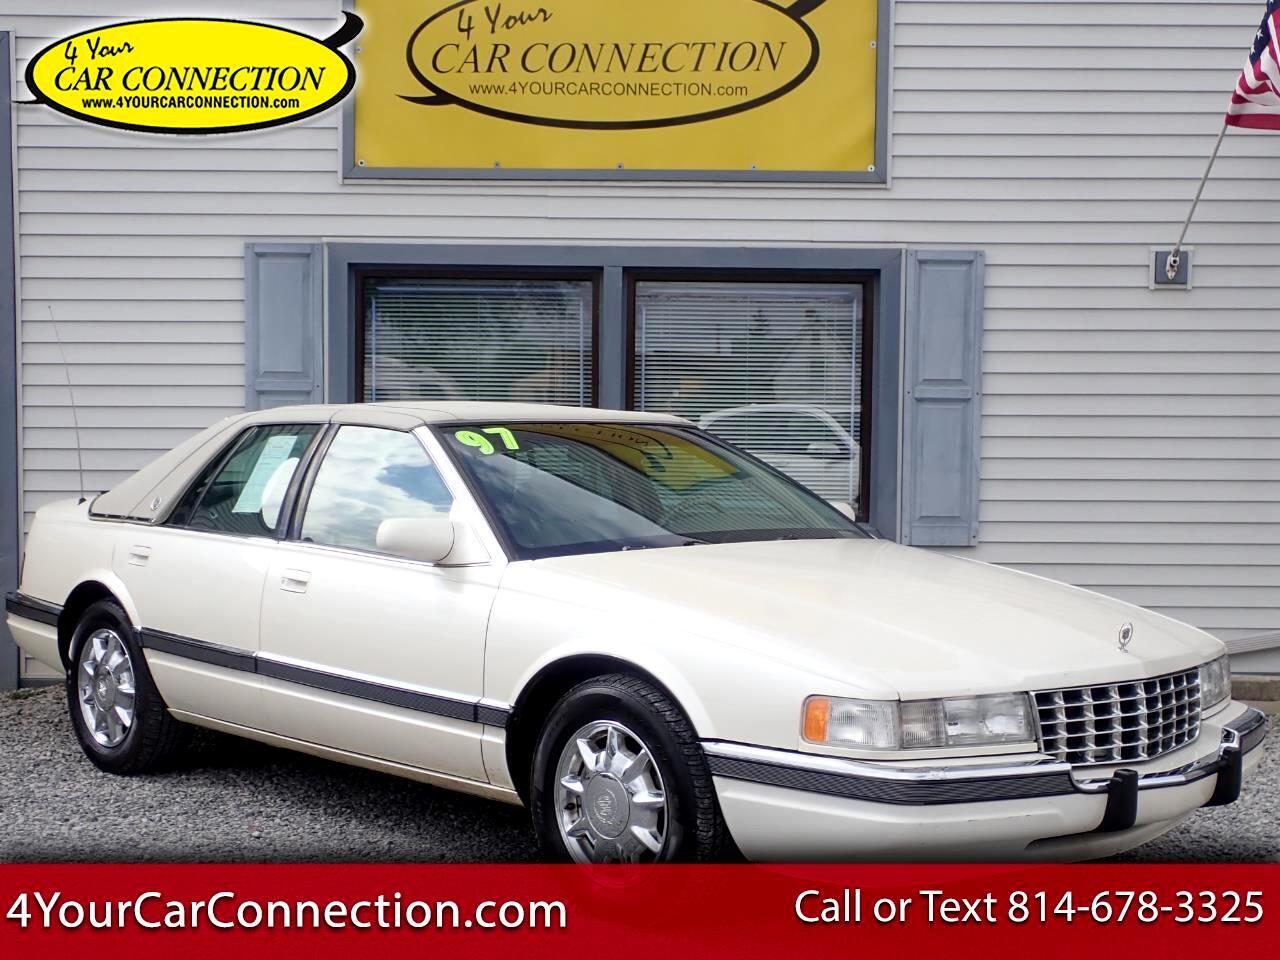 1997 Cadillac Seville Luxury SLS